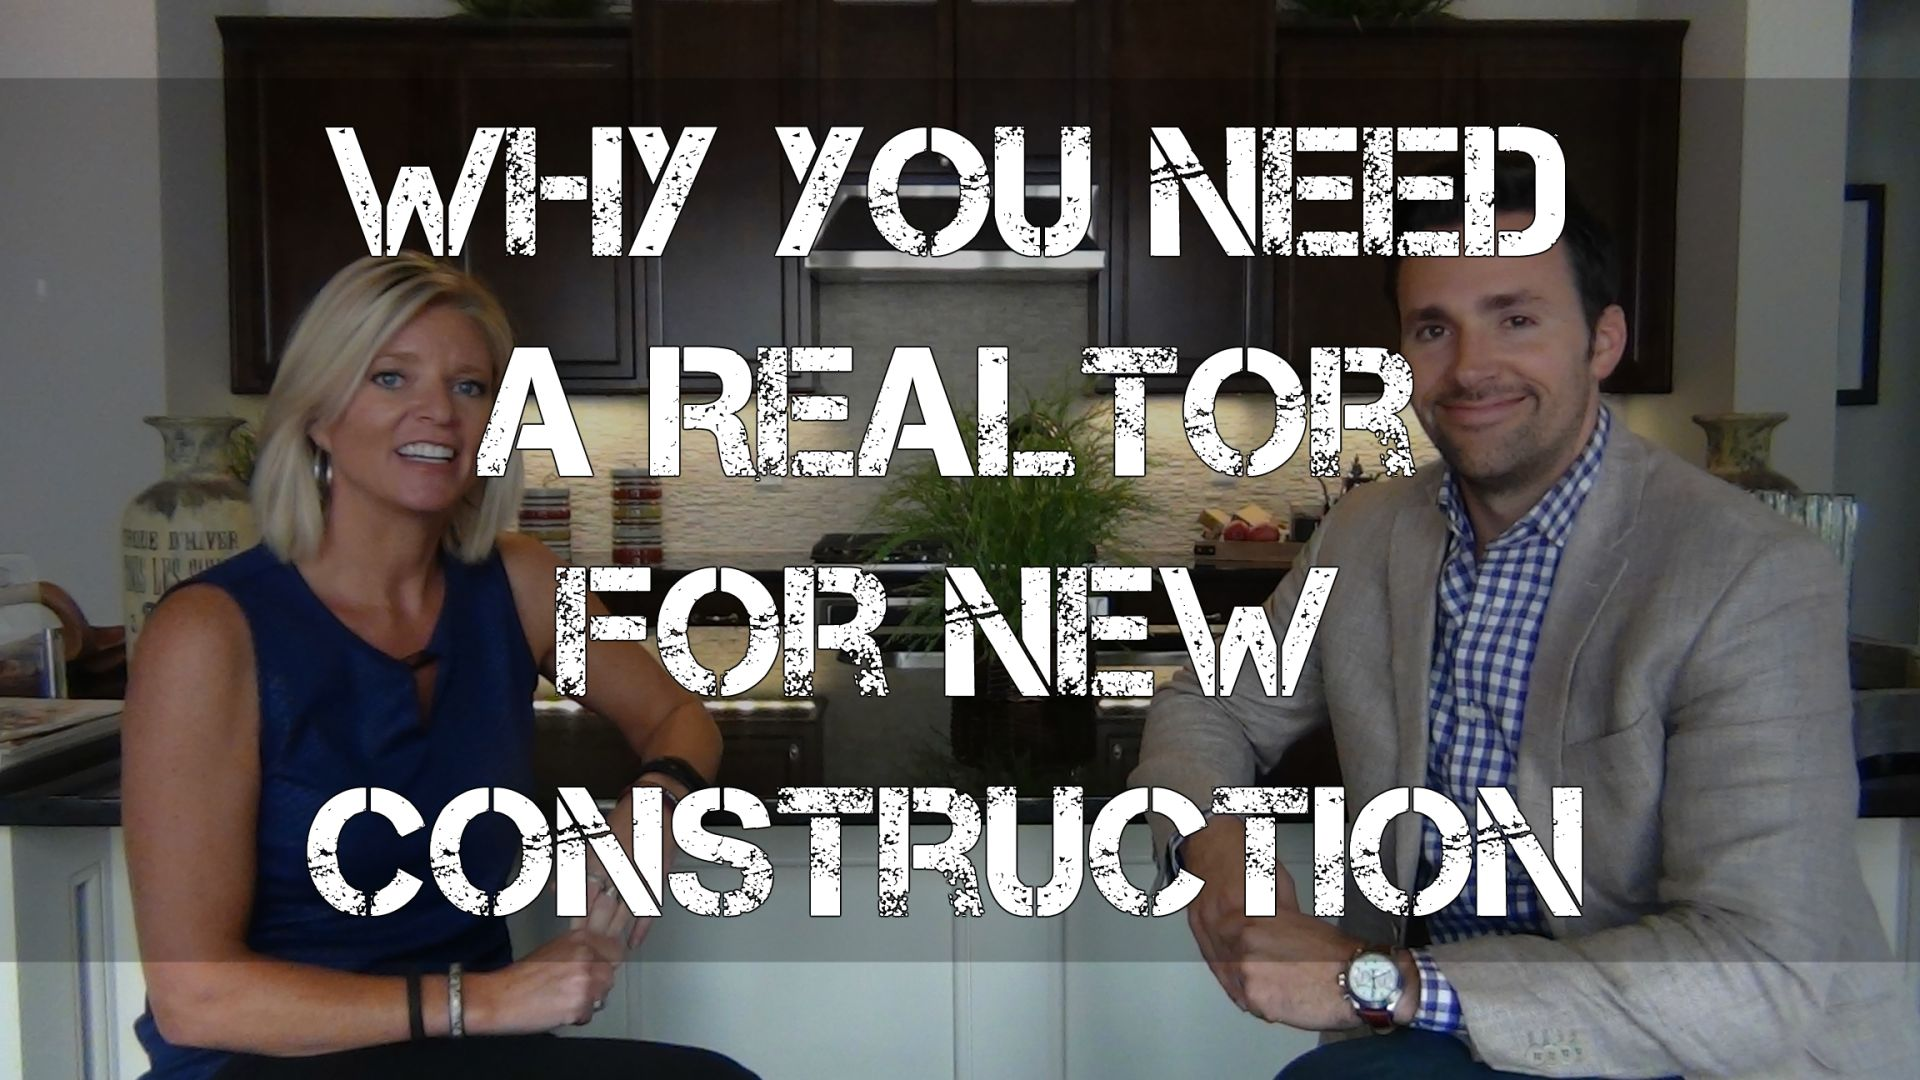 You need a Realtor when building a house?